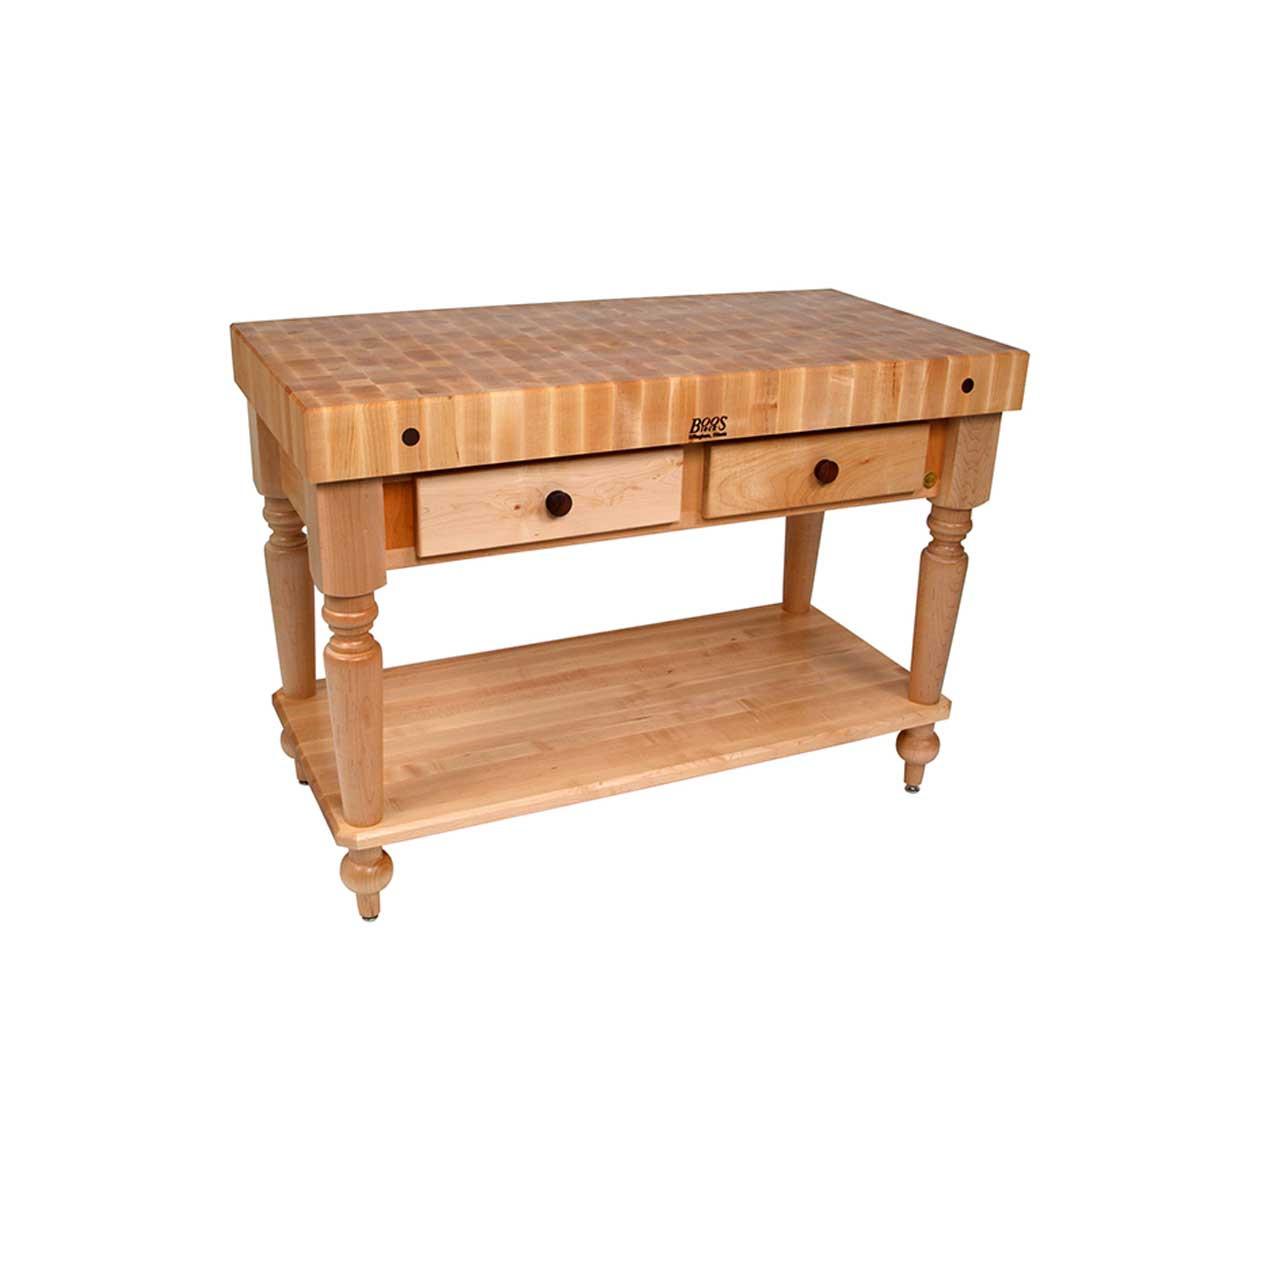 Kitchen Island 24 X 24 cuttingboards - john boos rustica kitchen island with shelf 48